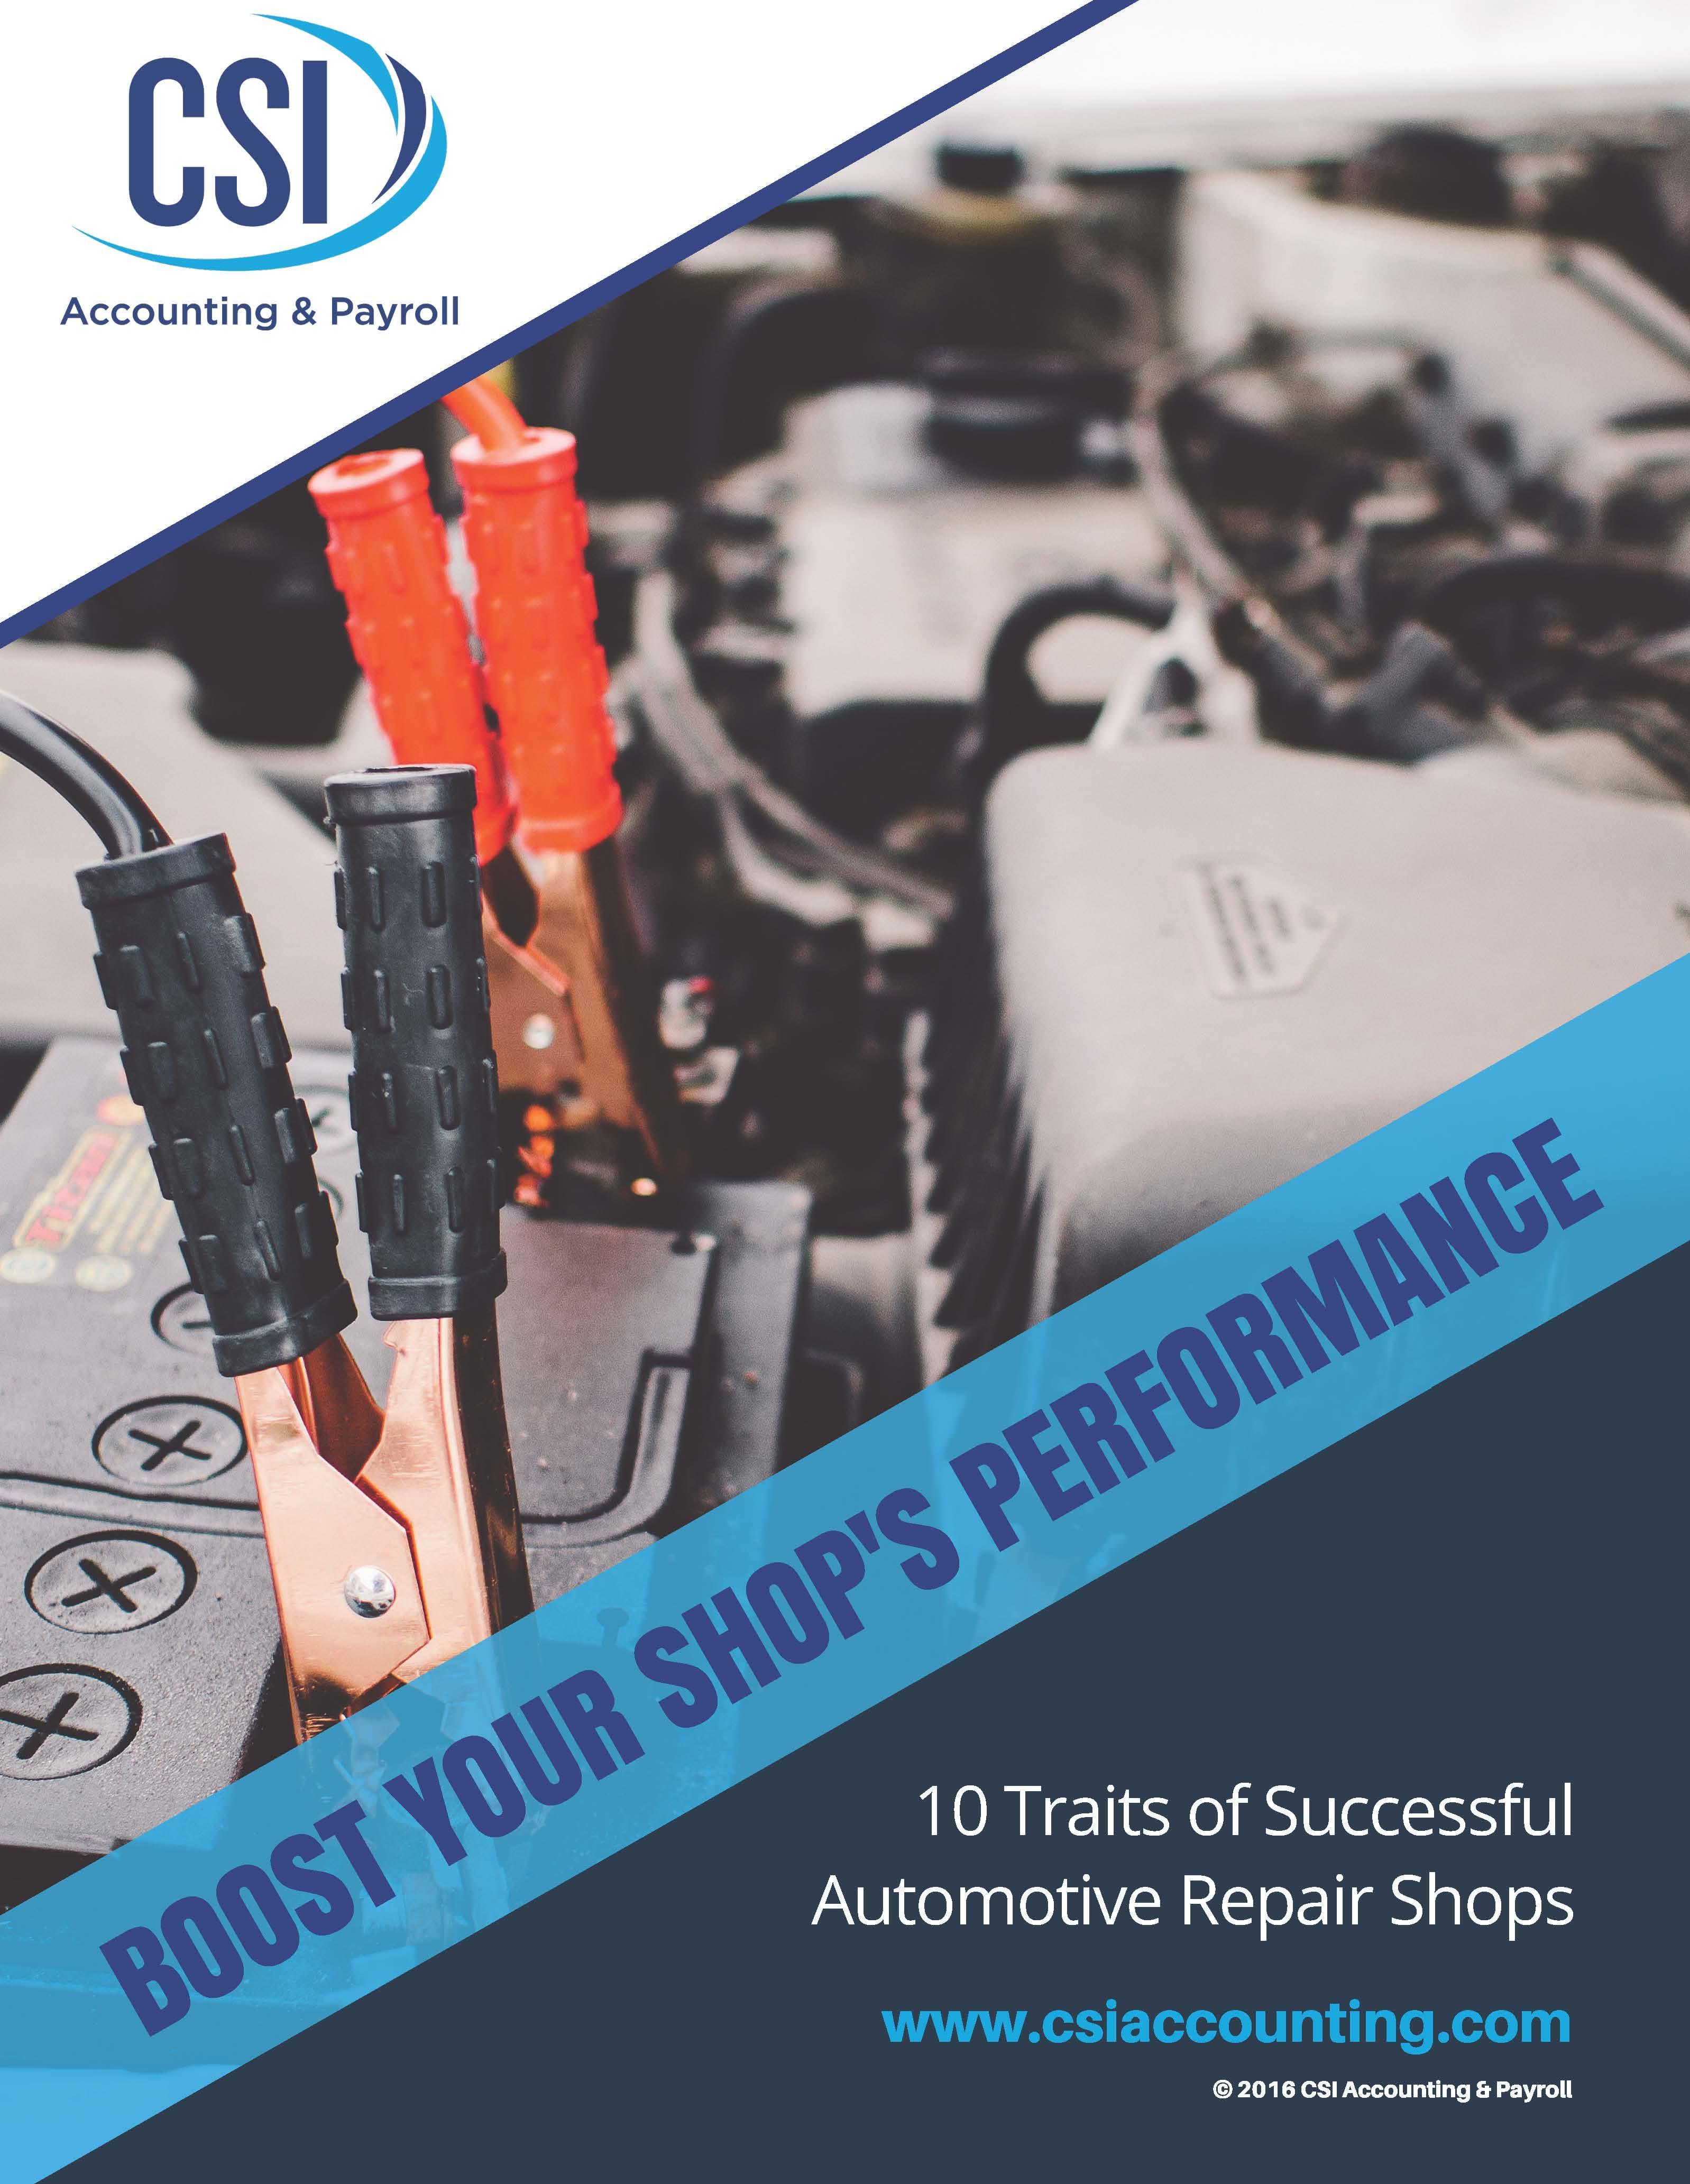 10 Traits of Successful Automotive Repair Shops eBook Cover